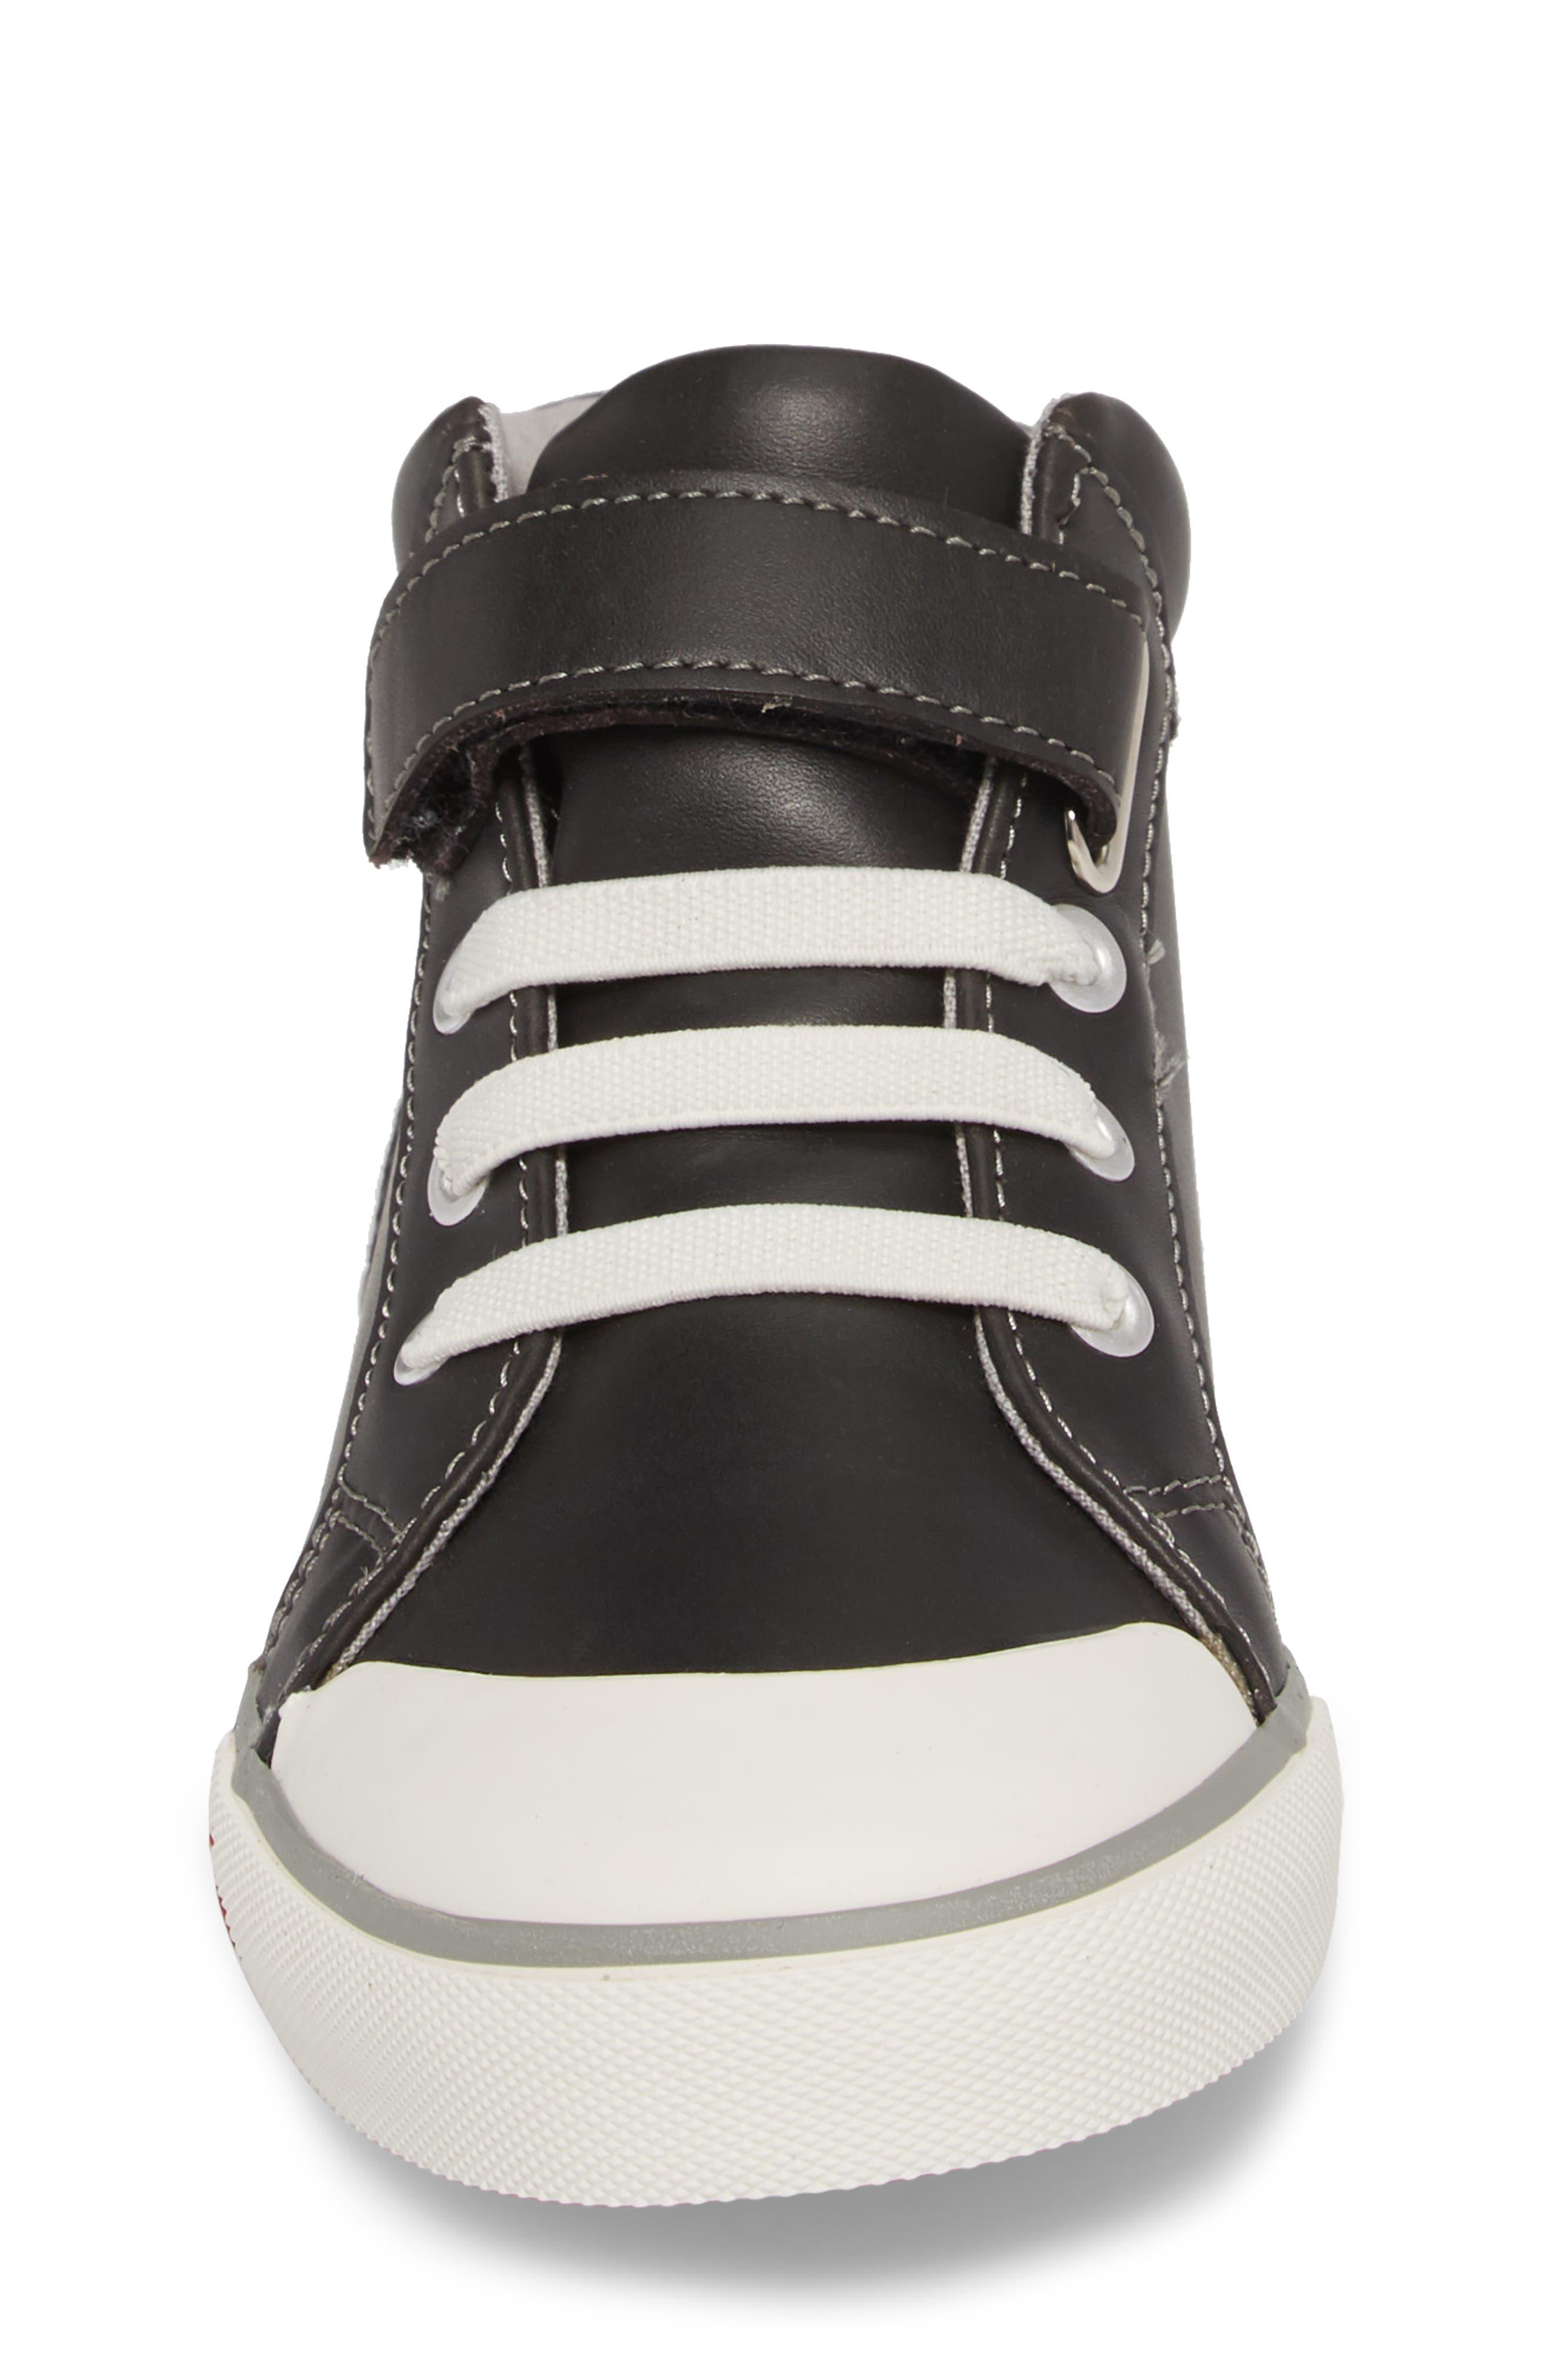 Peyton Metallic Mid Top Sneaker,                             Alternate thumbnail 6, color,                             Black Leather